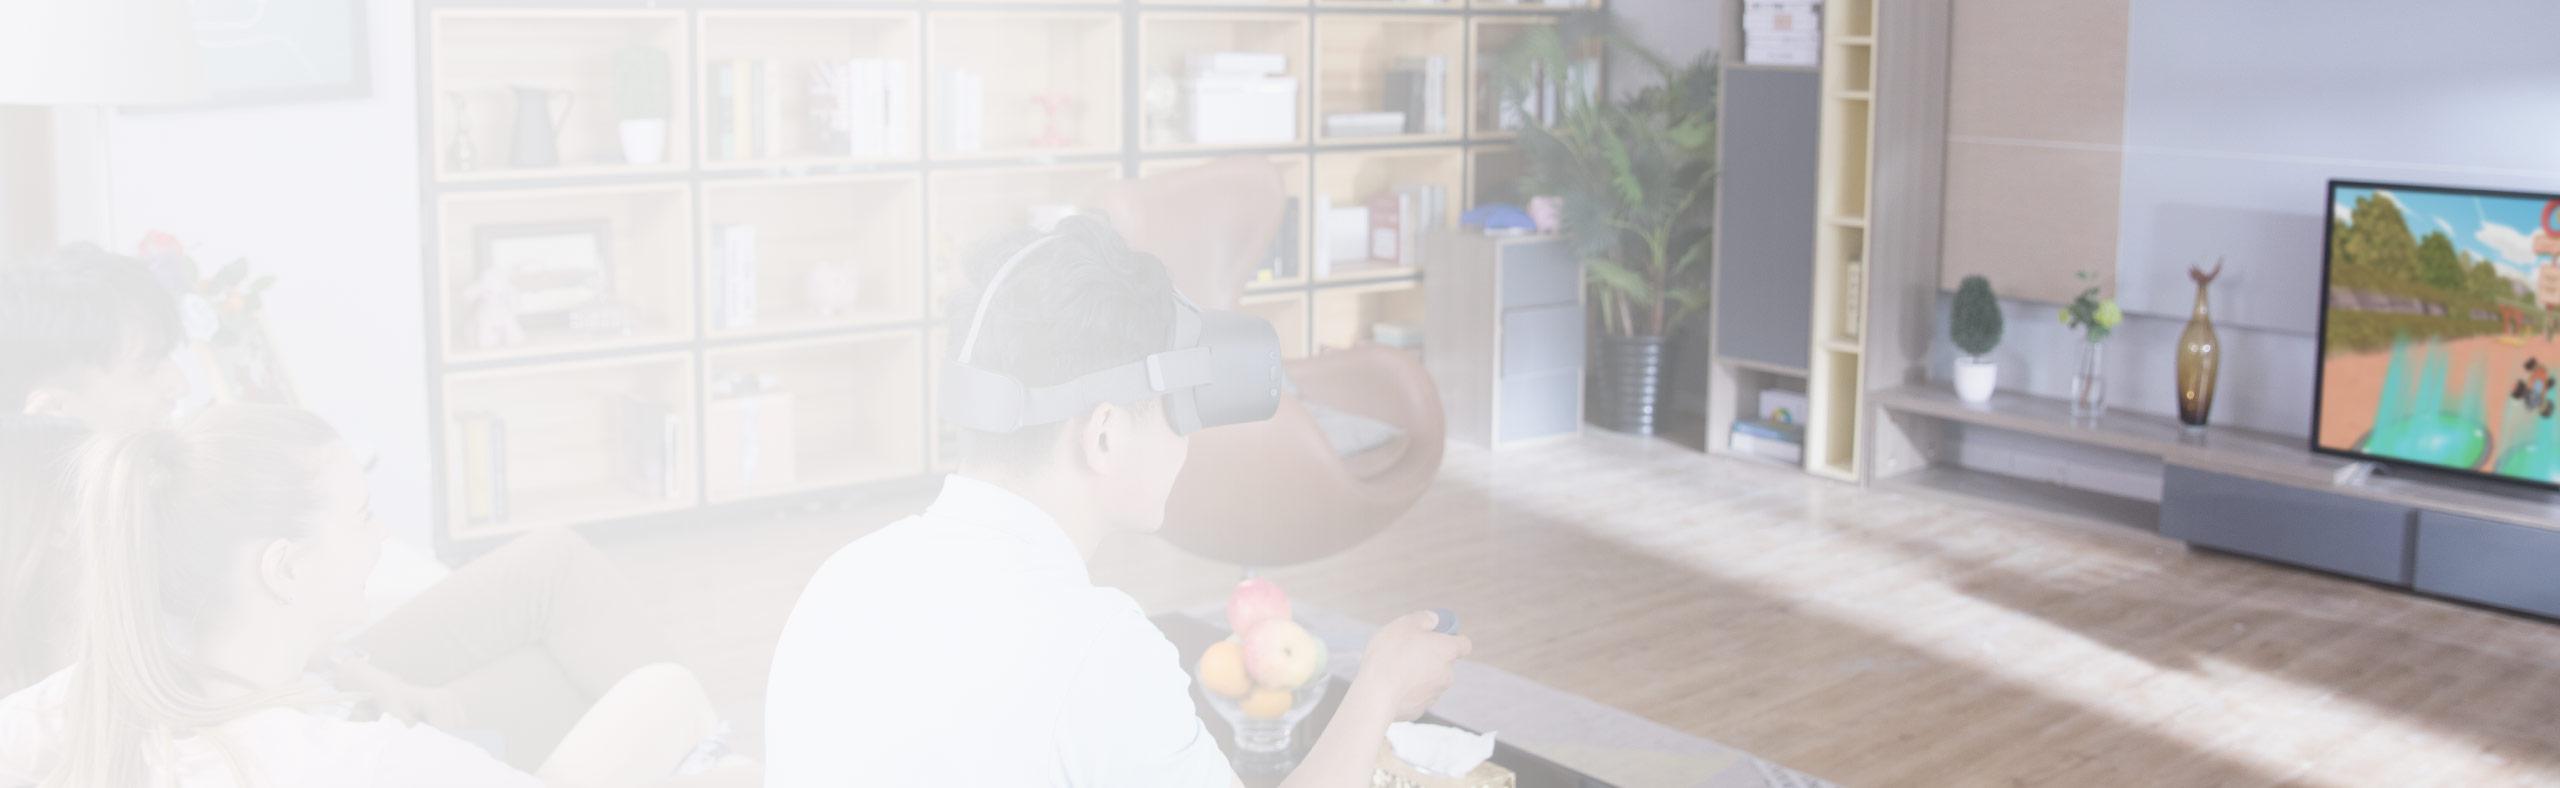 Pico UI VR操作界面